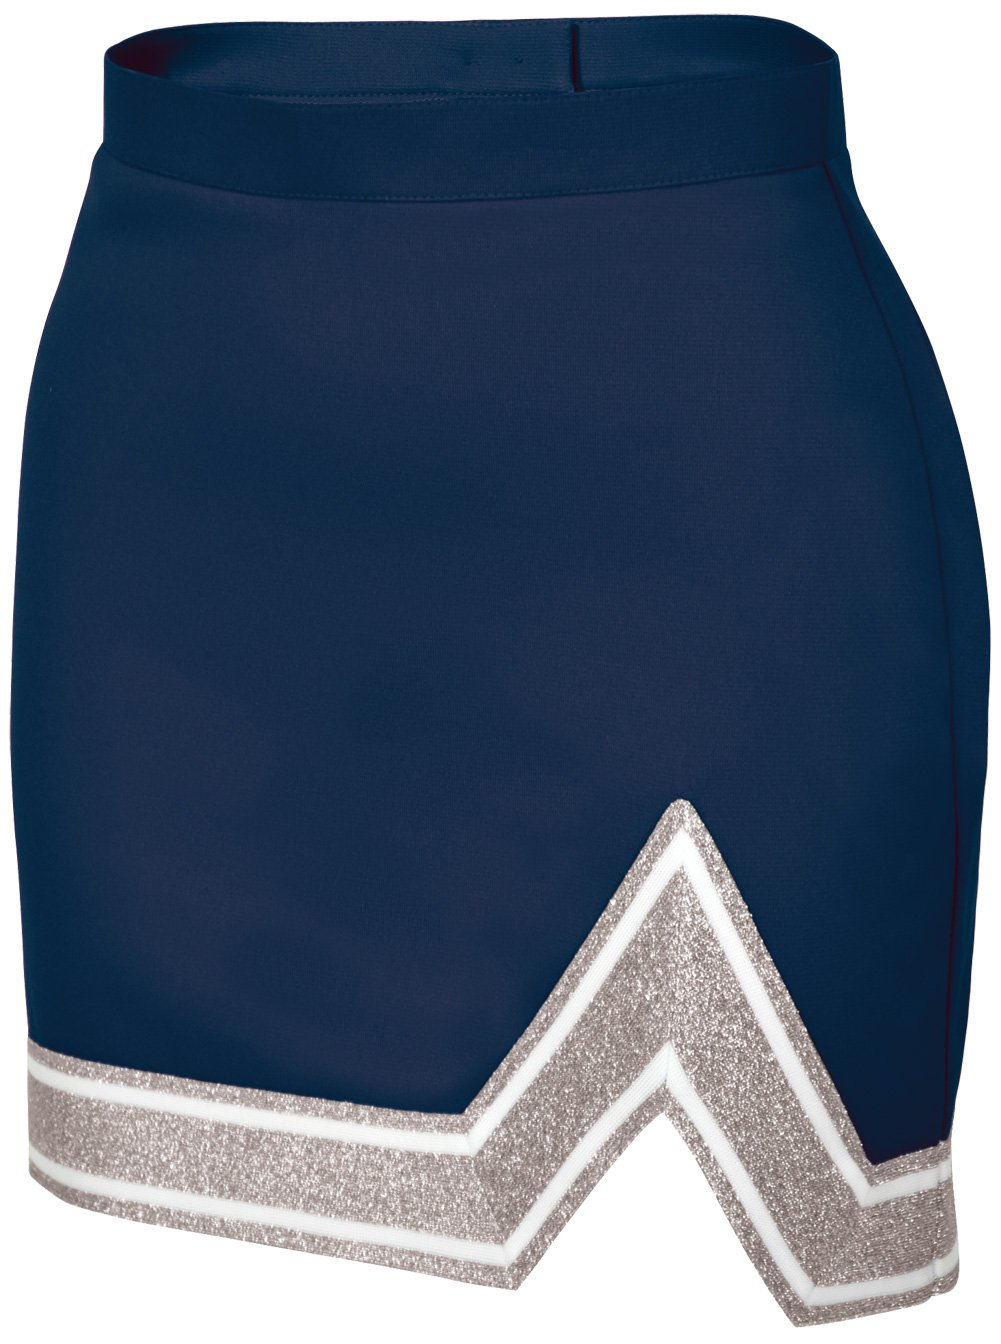 Chassé Womens' Blaze Skirt Navy/White/Metallic Silver Adult X-Small